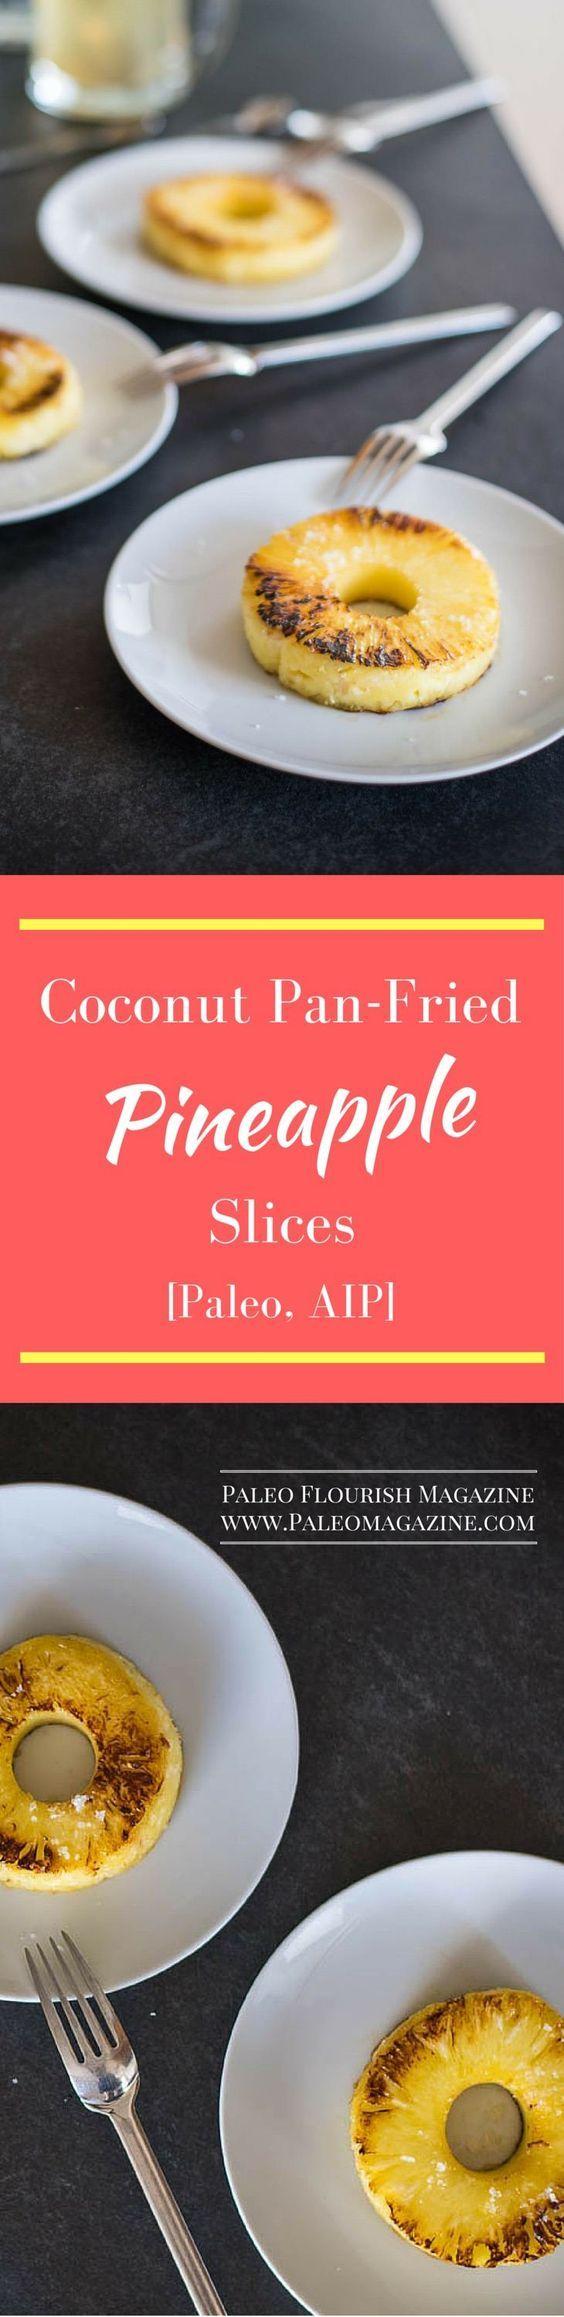 Coconut Pan-Fried Pineapple Recipe [Paleo, AIP] #paleo #AIP #recipes http://paleomagazine.com/coconut-pan-fried-pineapple-recipe